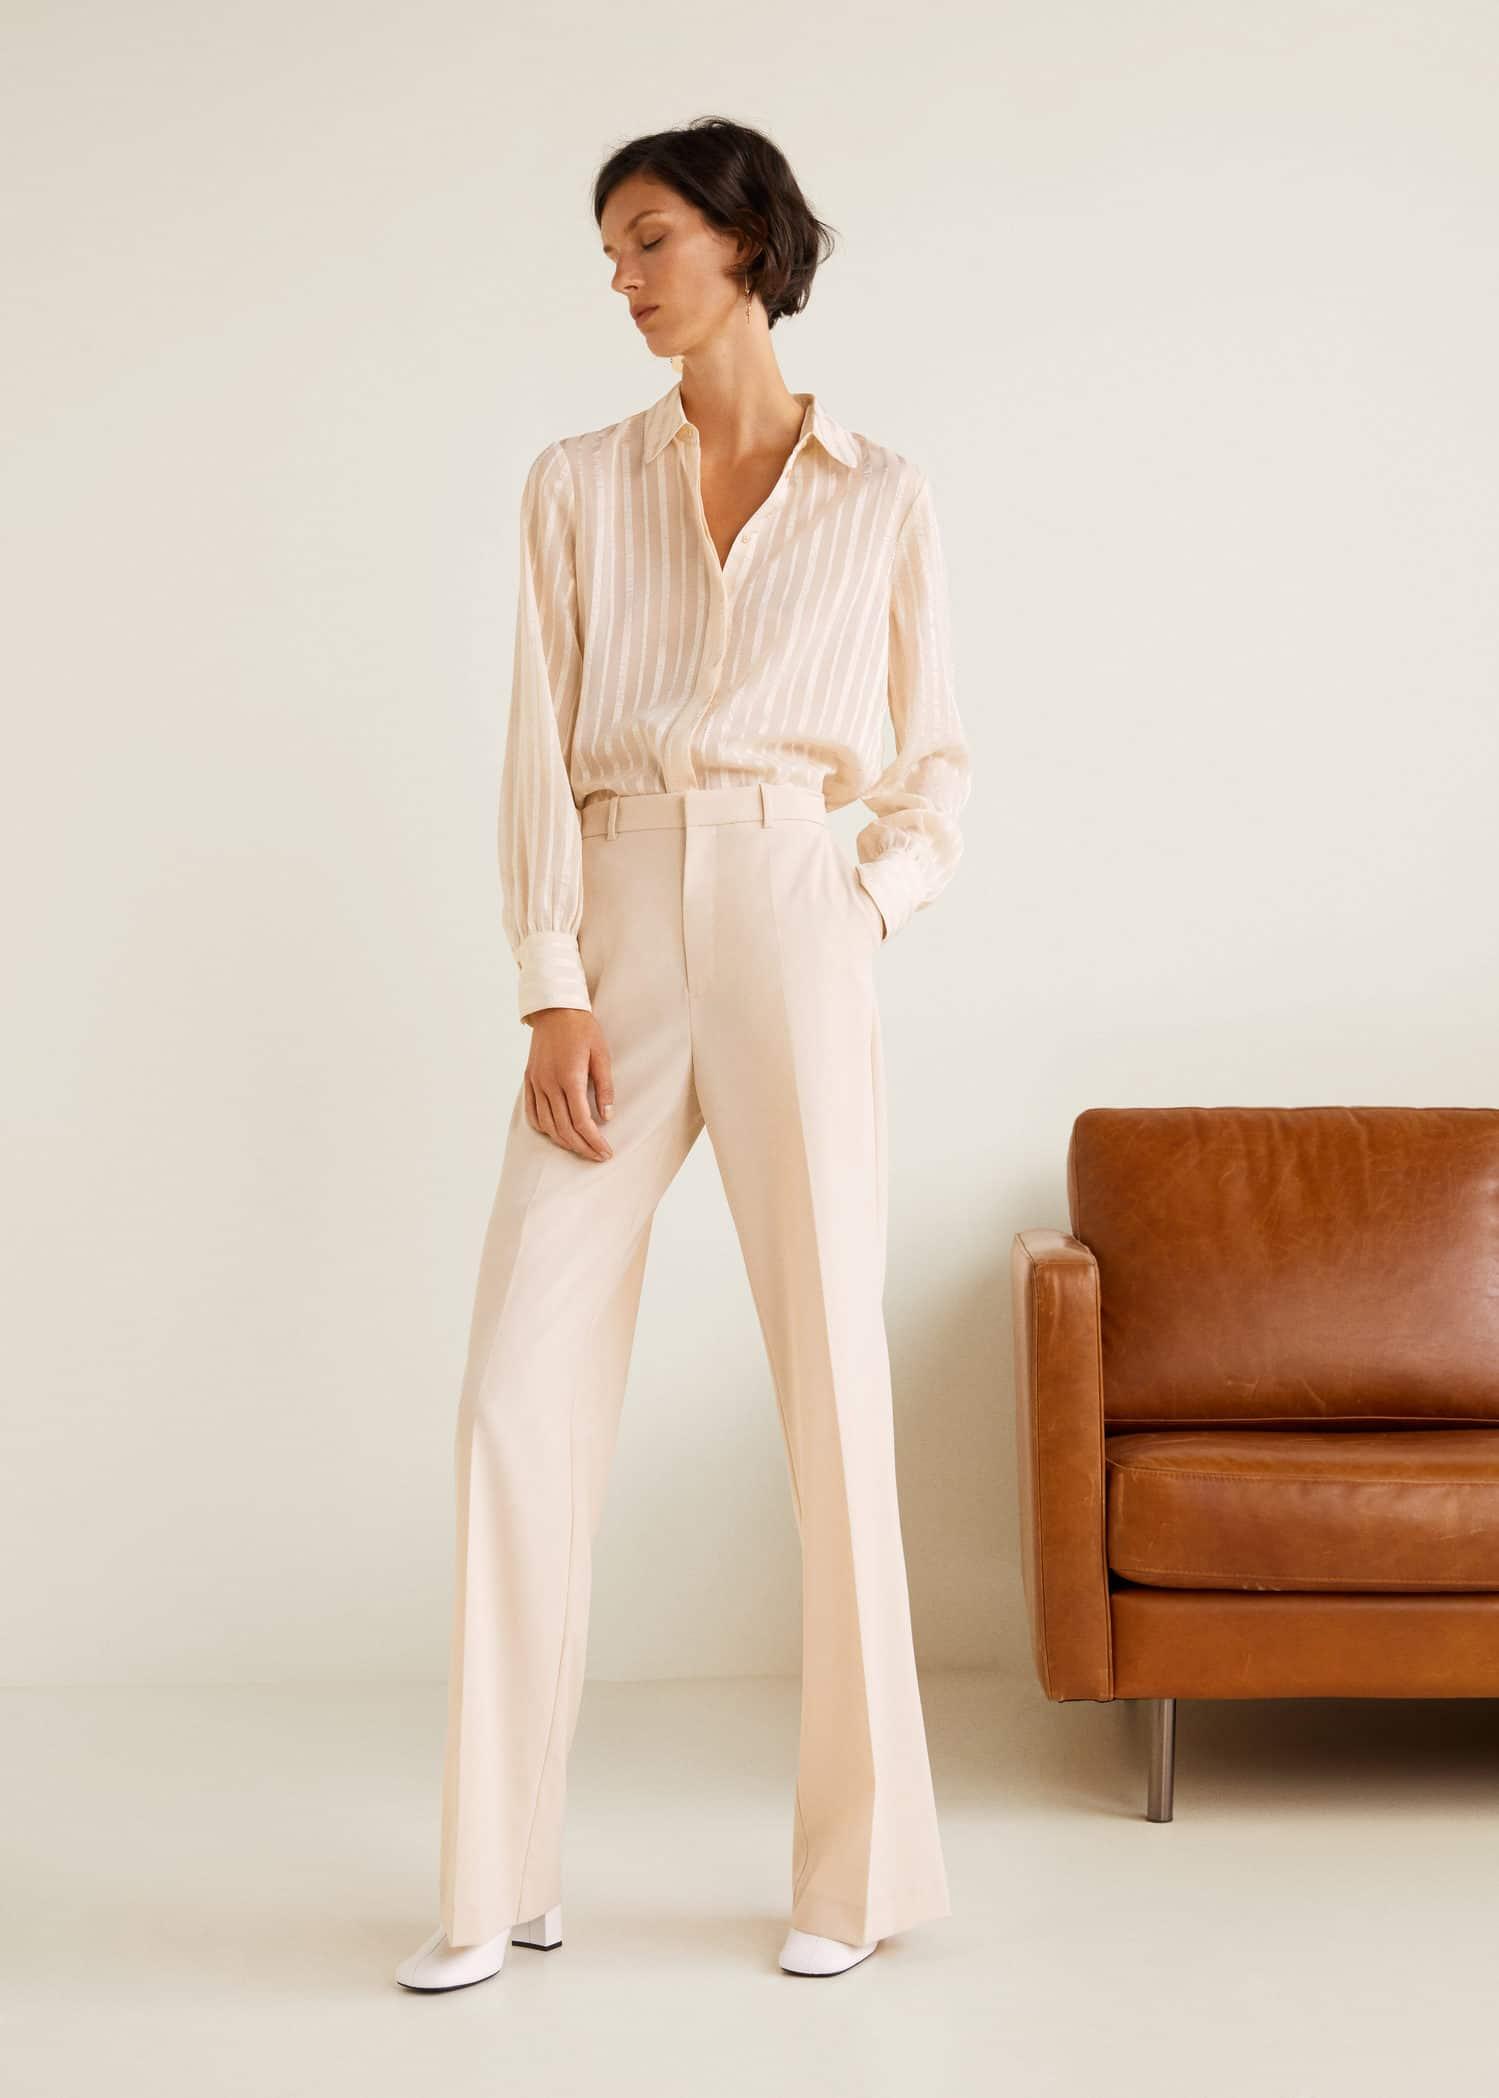 Palazzo France Pantalon Femme Taille Haute Mango ZvFqdUwB 9b9fd7eeab0b